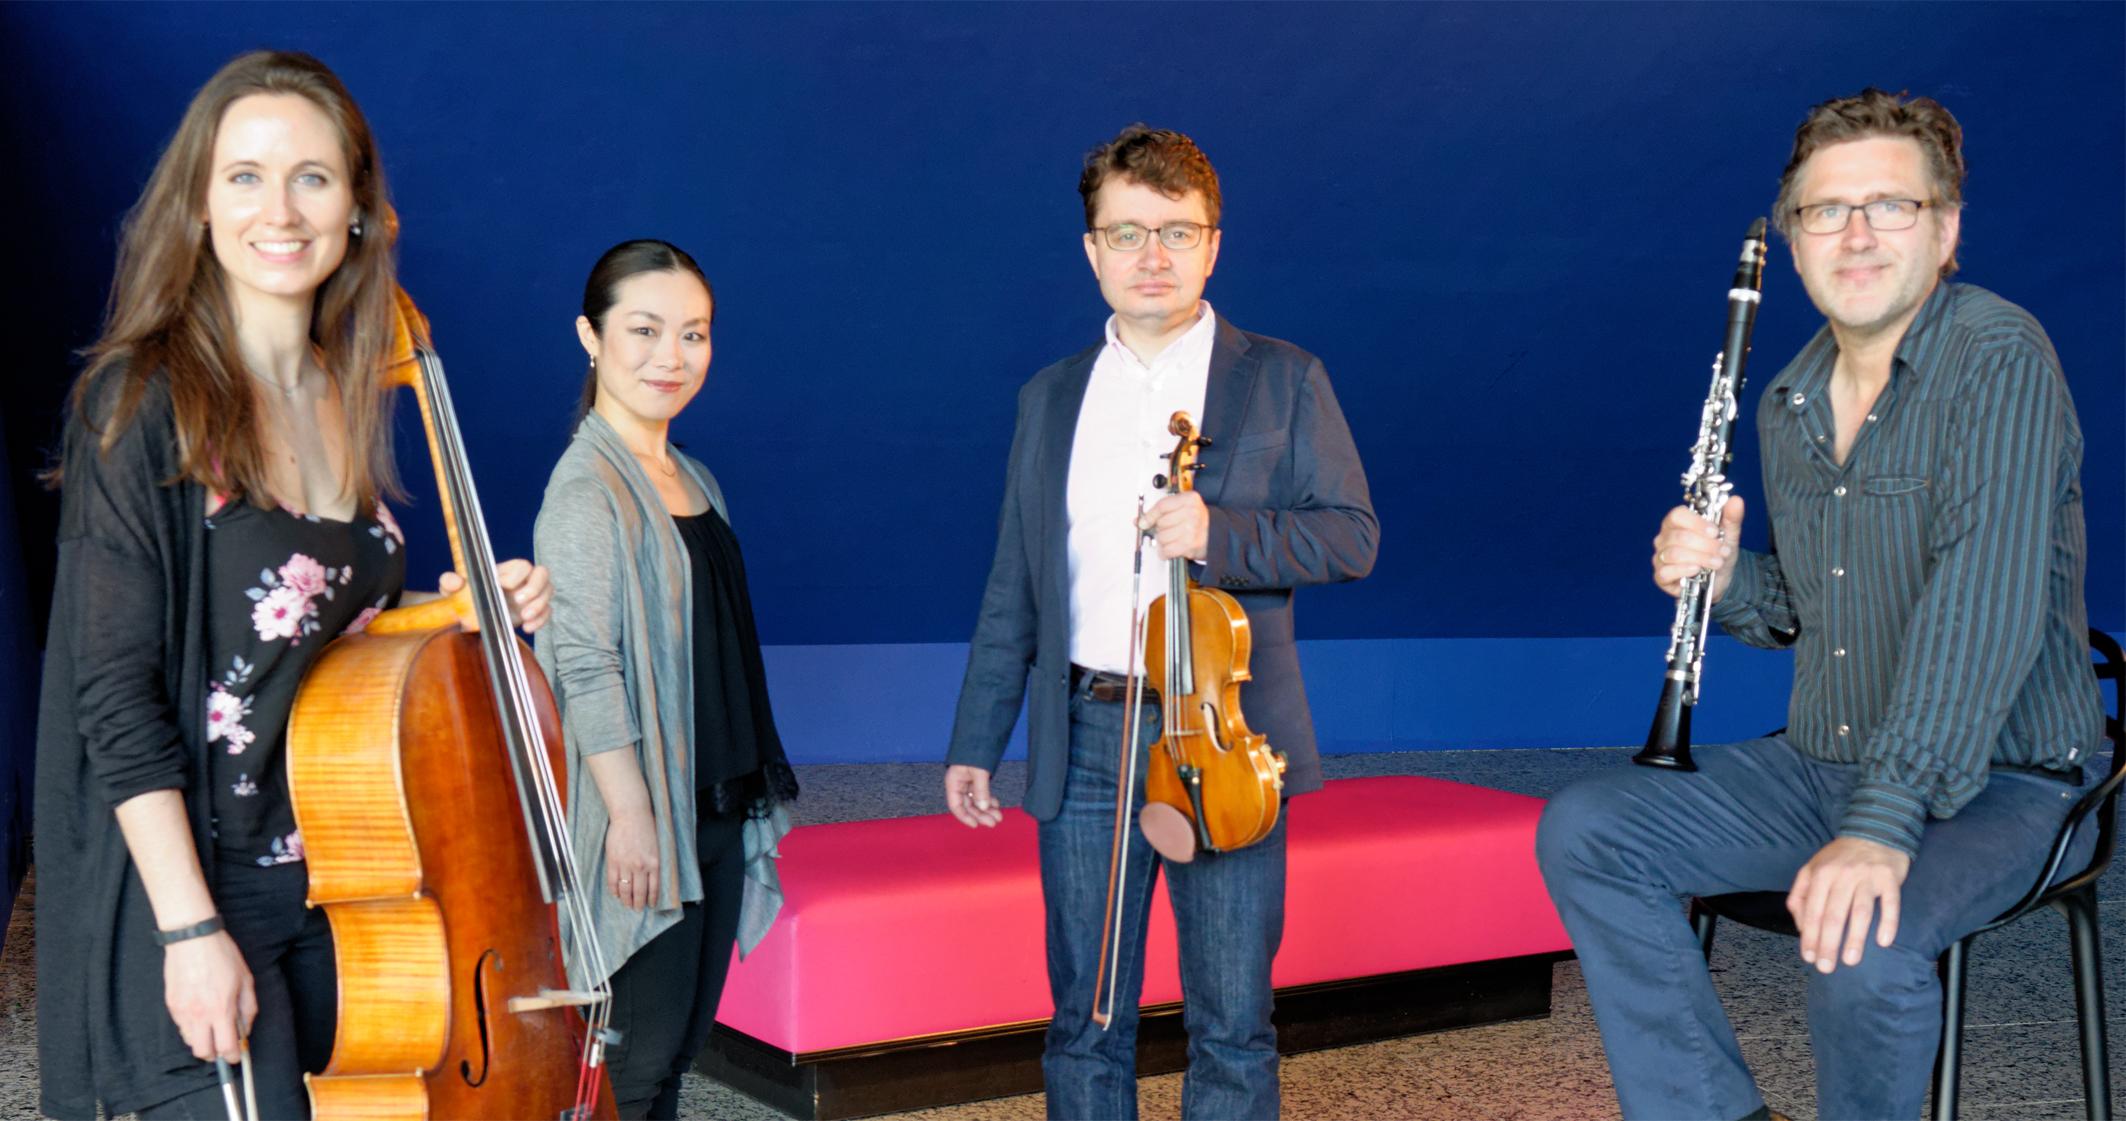 Herdenkingsconcert 4 mei: Messiaen ensemble